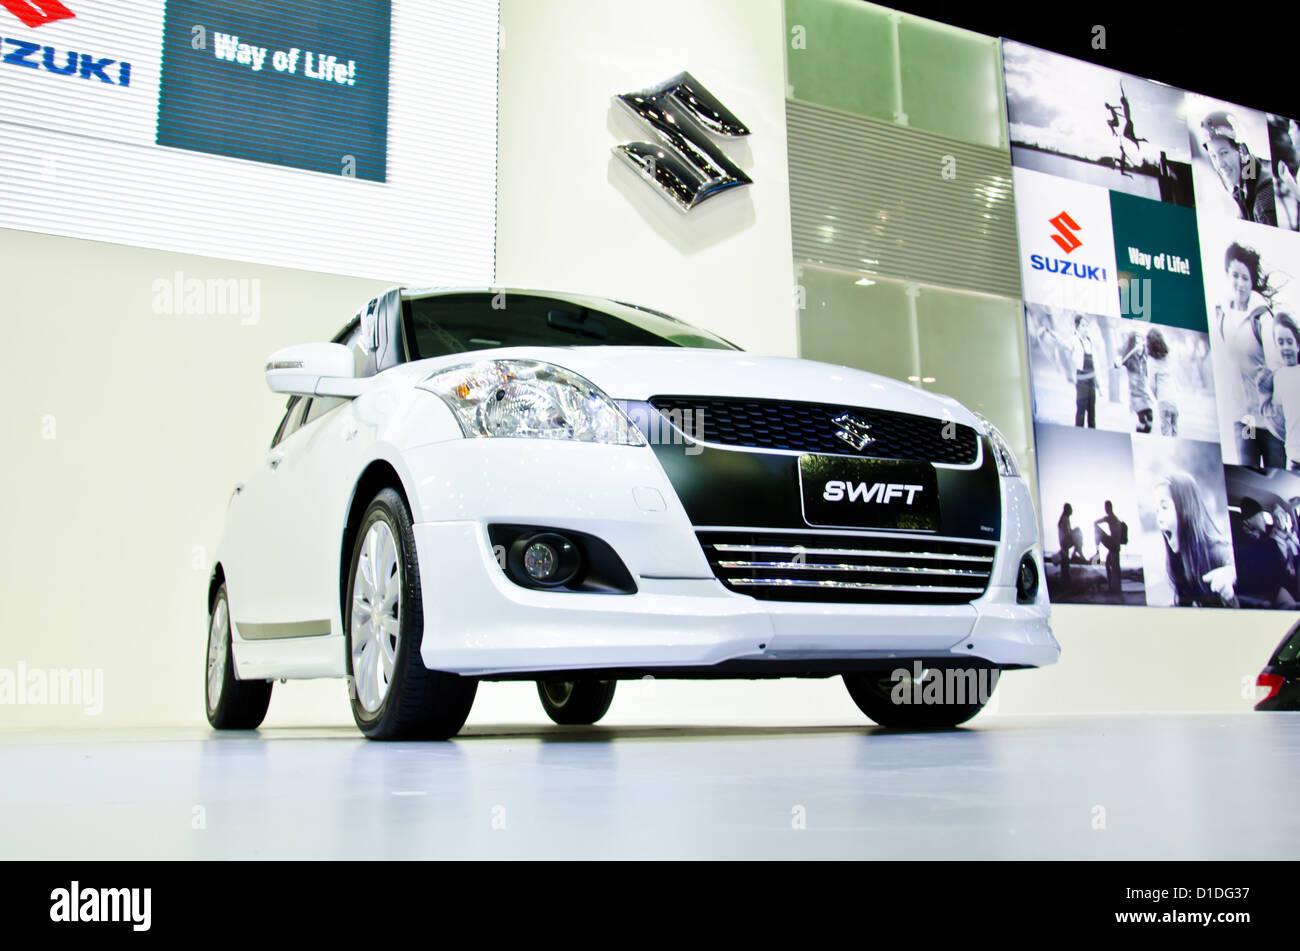 The Suzuki Swift Car On Display At The 29th Thailand International